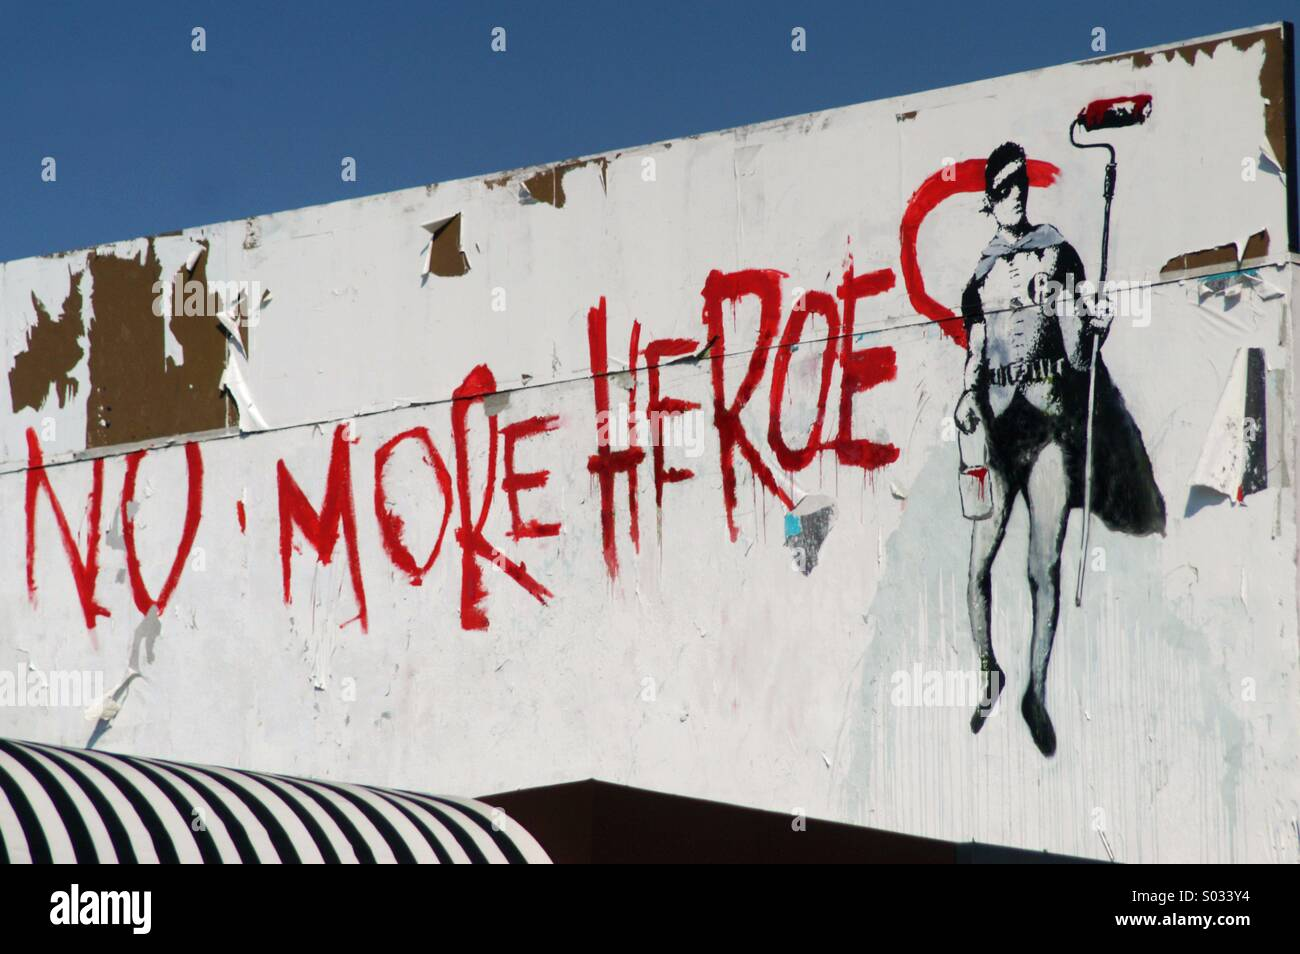 Banksy graffiti on Melrose, Los Angeles Stock Photo